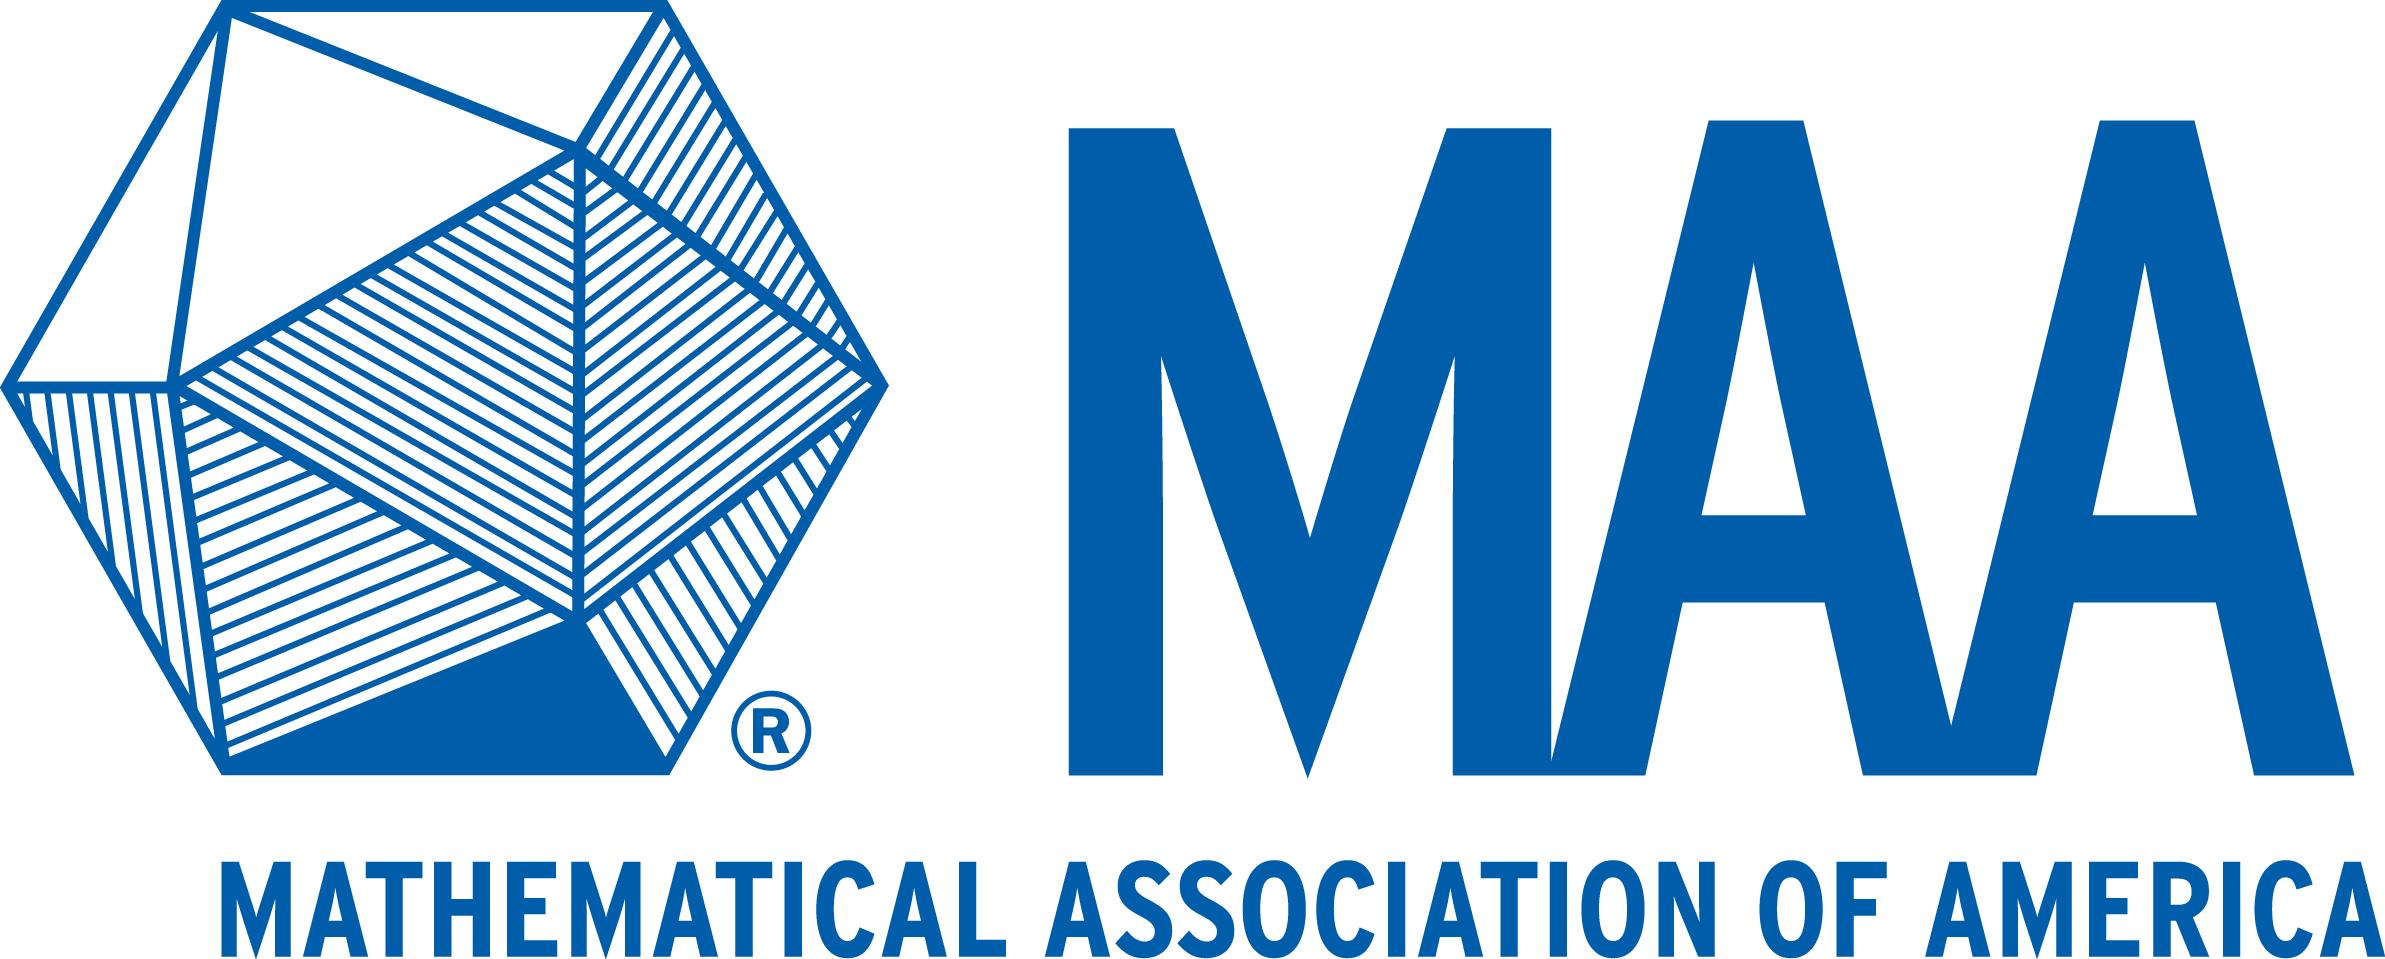 Mathematical Association of America logo